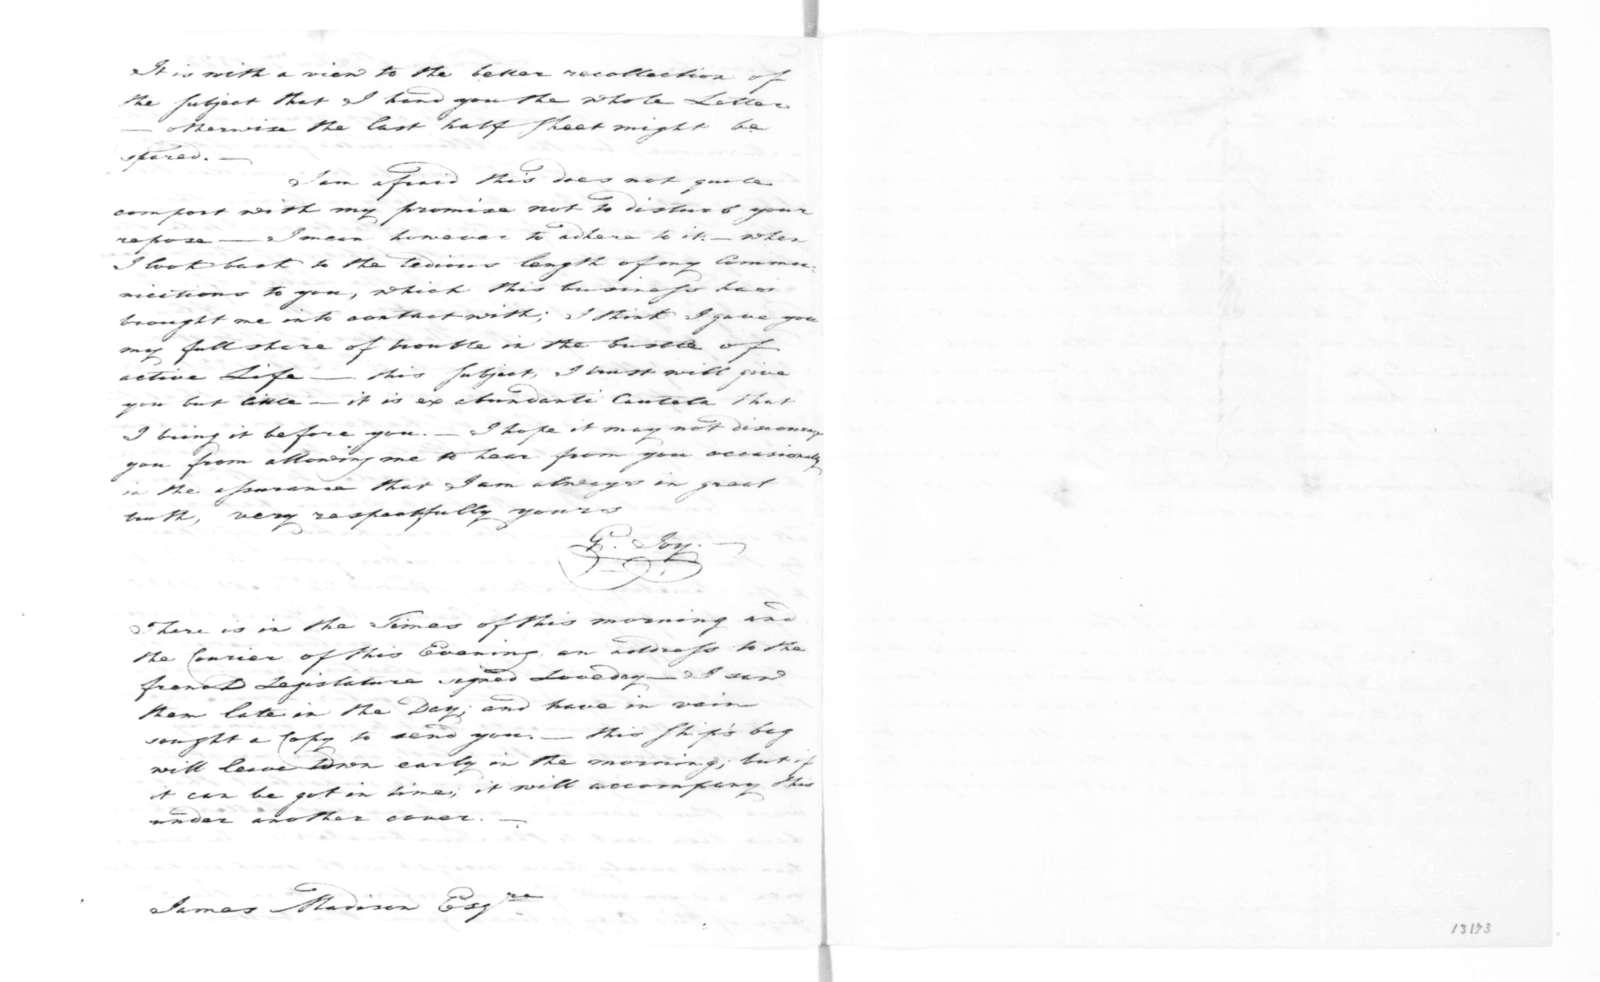 George Joy to James Madison, January 9, 1822.